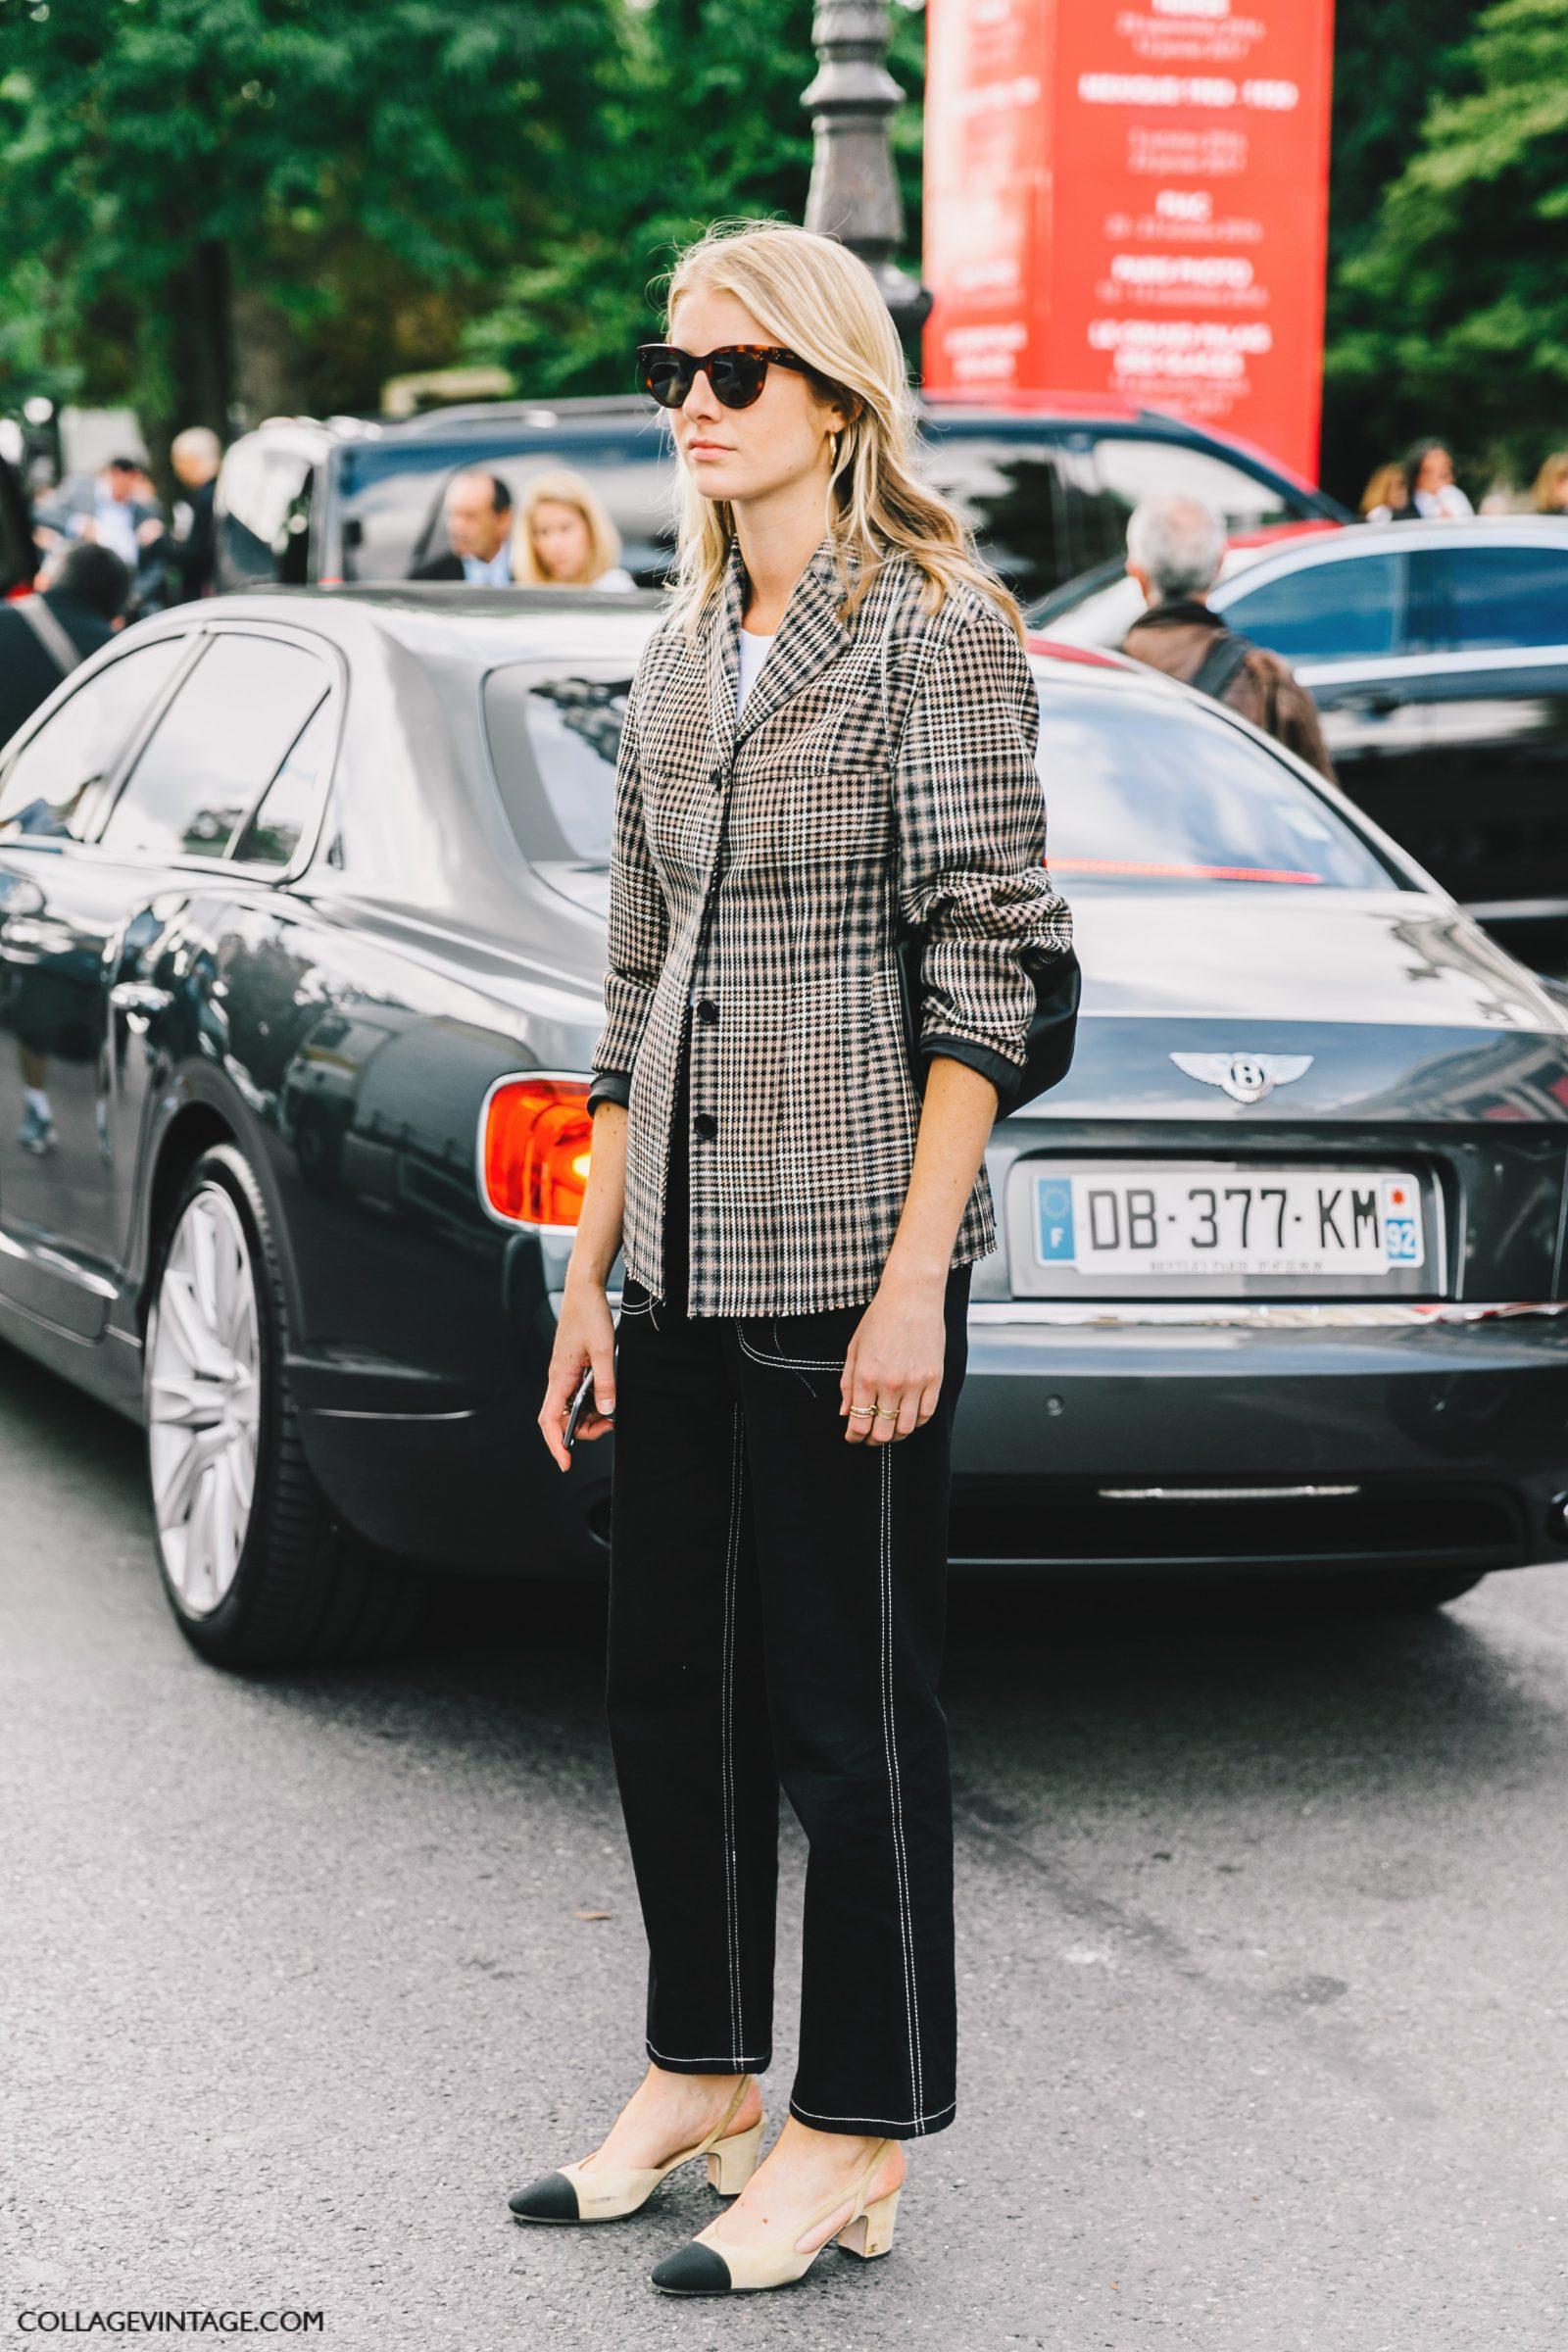 pfw-paris_fashion_week_ss17-street_style-outfits-collage_vintage-rochas-courreges-dries_van_noten-lanvin-guy_laroche-62